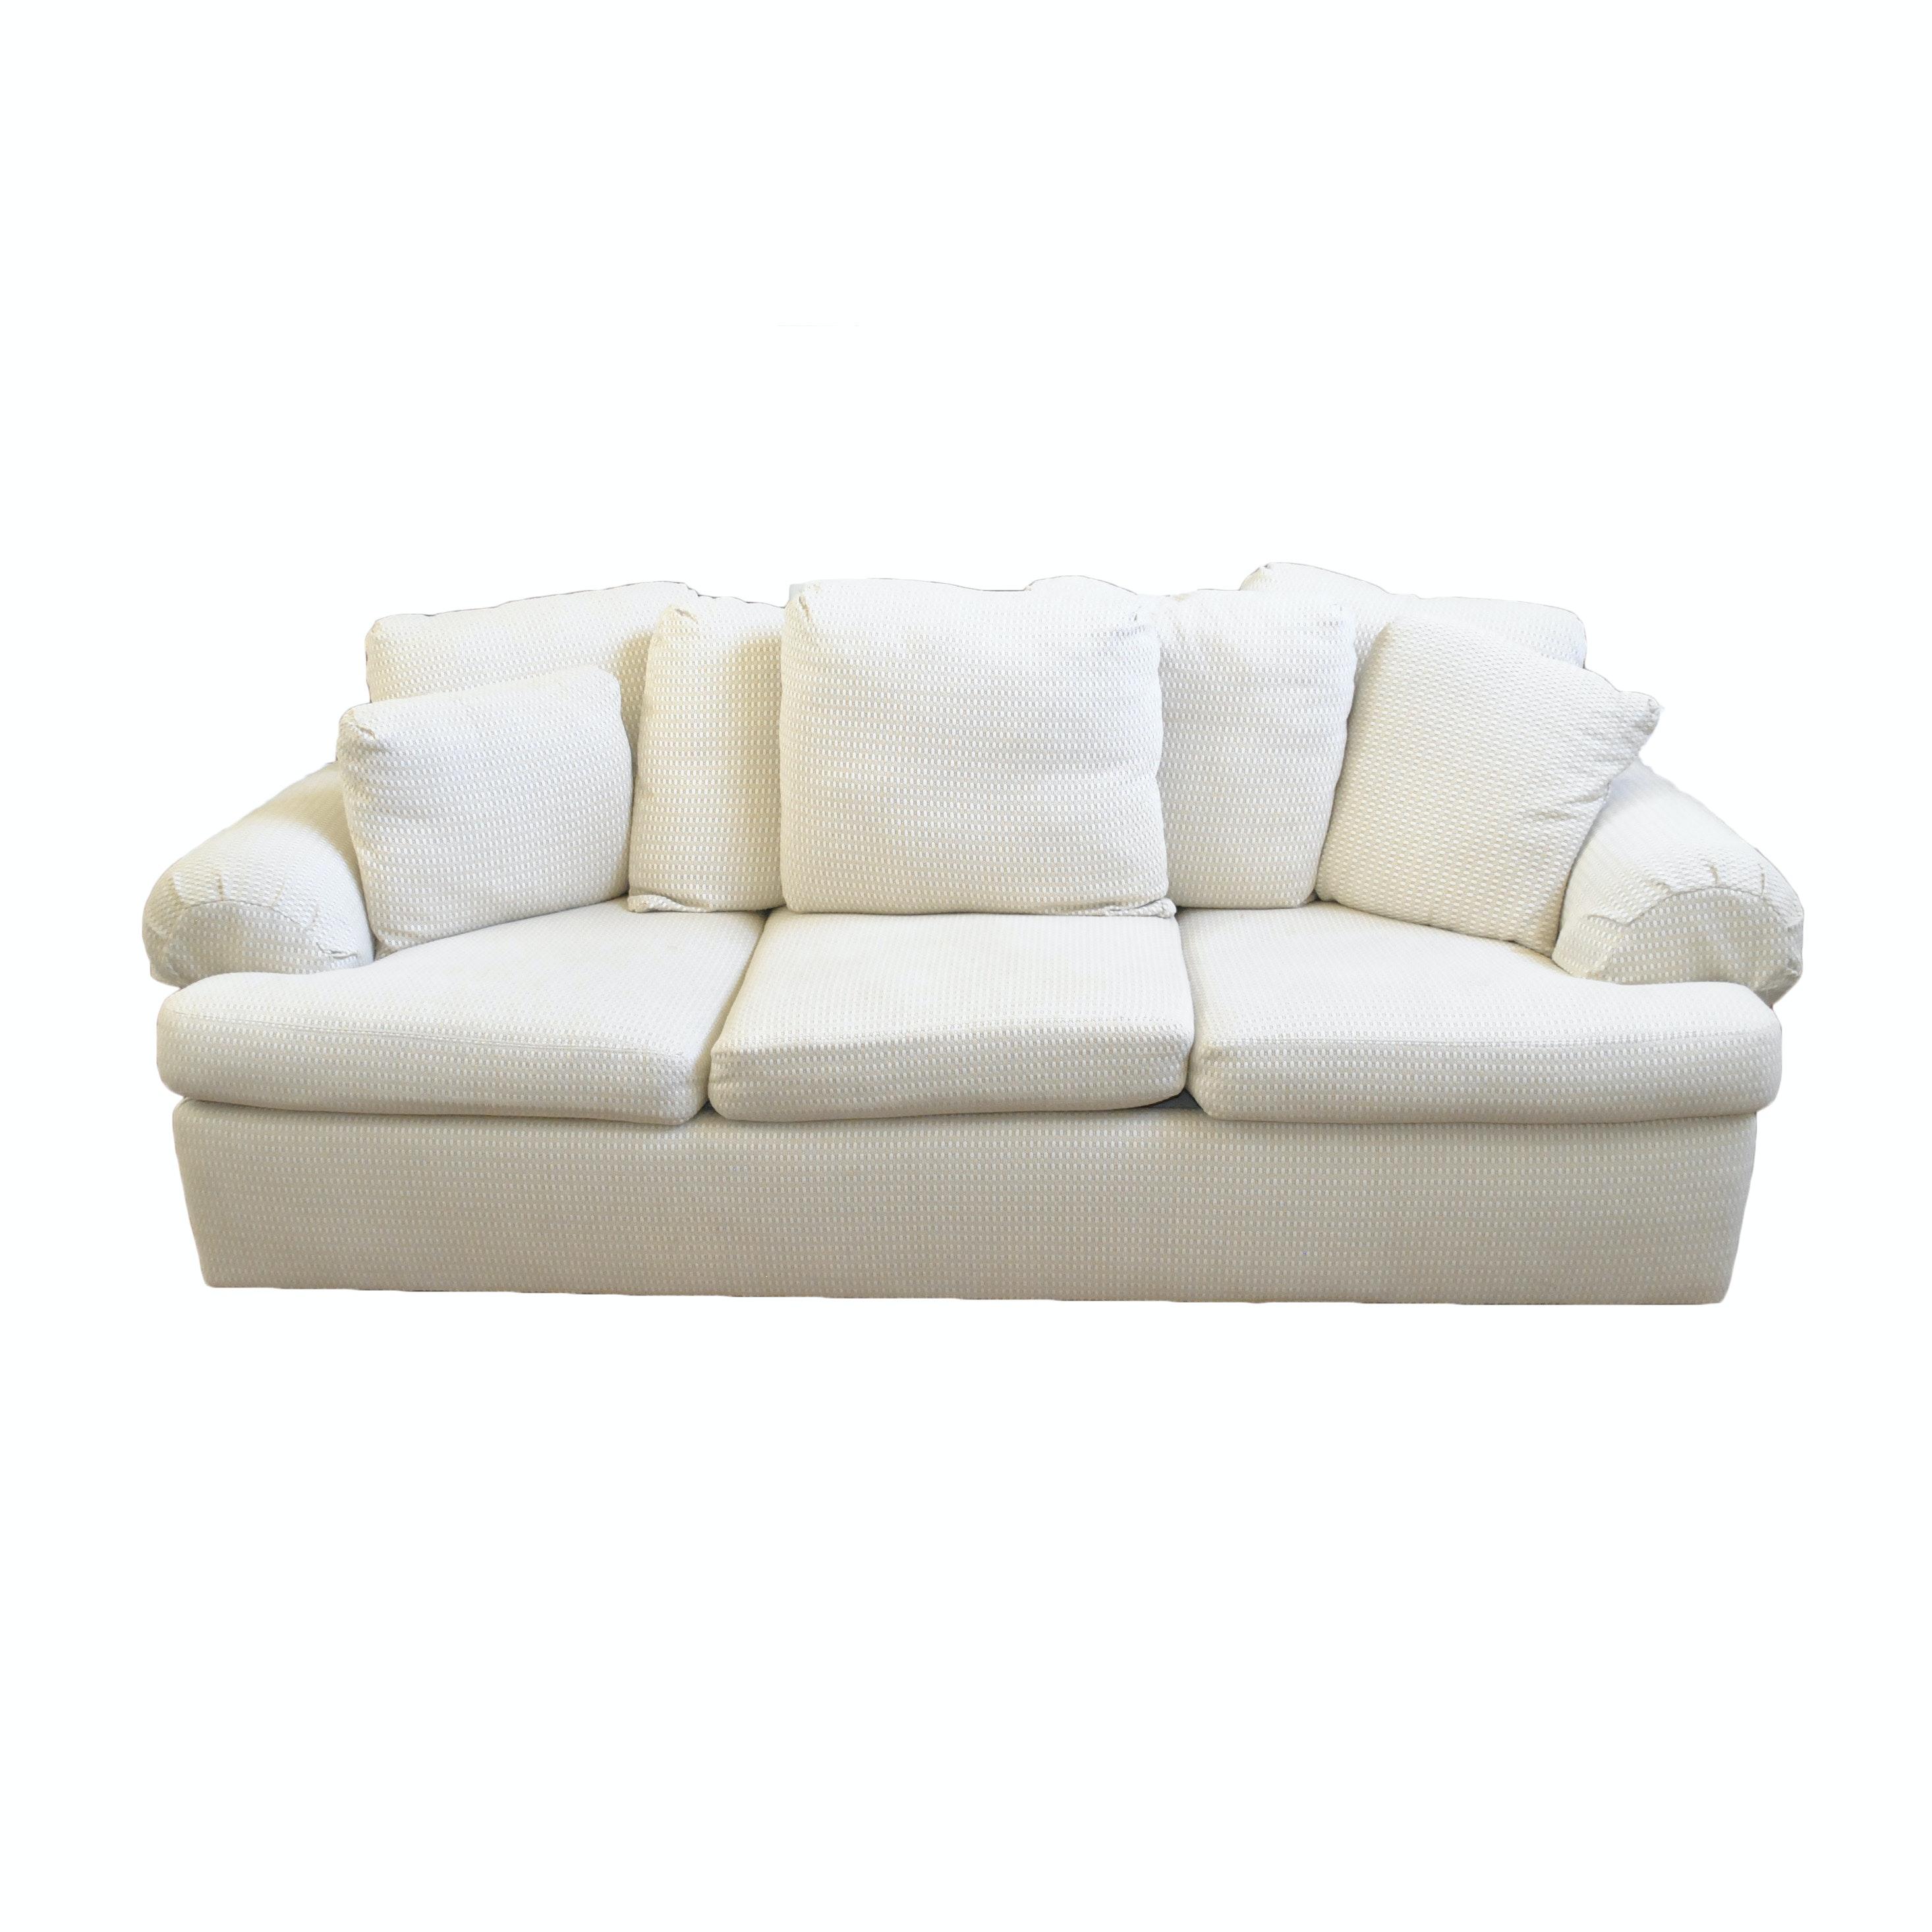 White Upholstered Sofa by Drexel